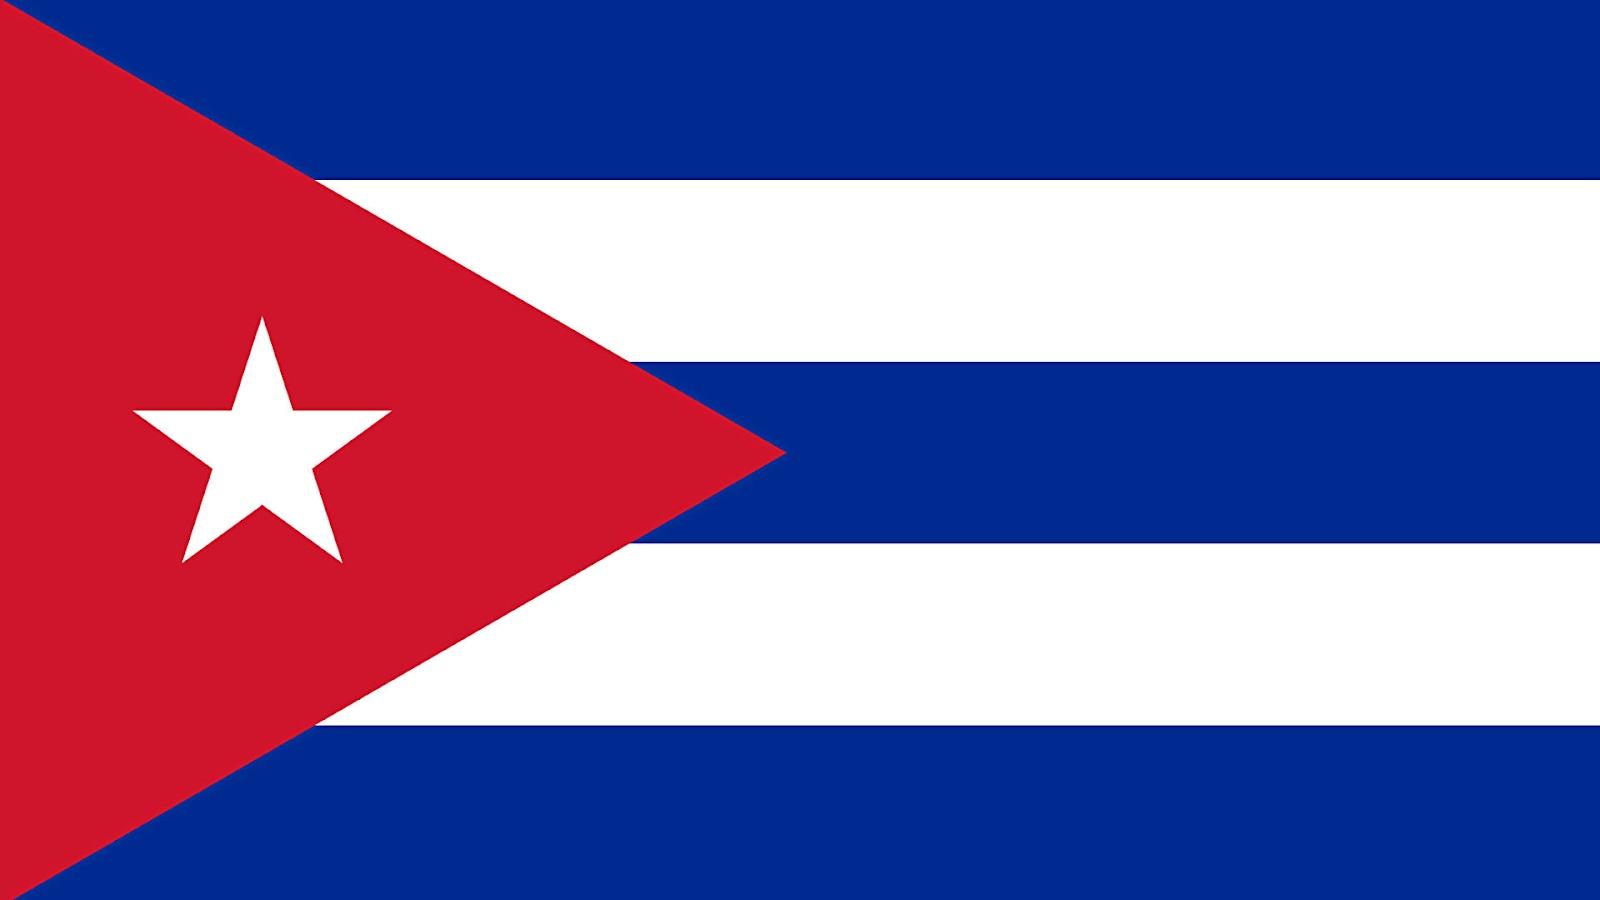 cuban-flag-ftrjpg_jcgwjsn36f4w13yufqmoss65z.jpg